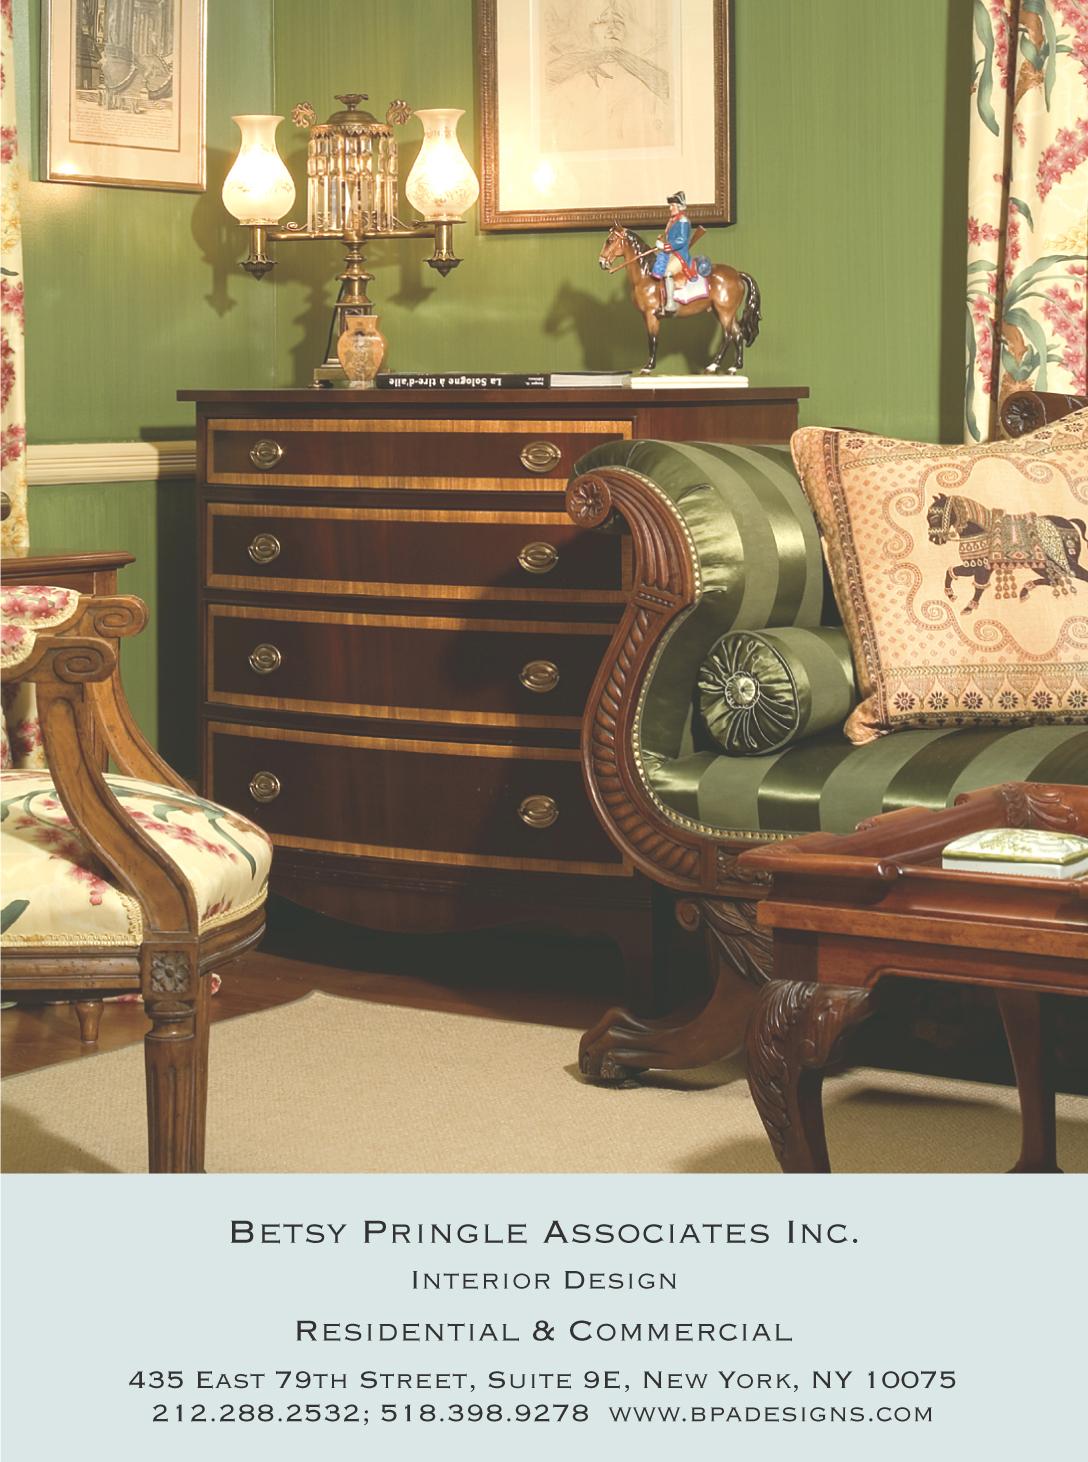 BetsyPringle_InteriorDesign_Ad